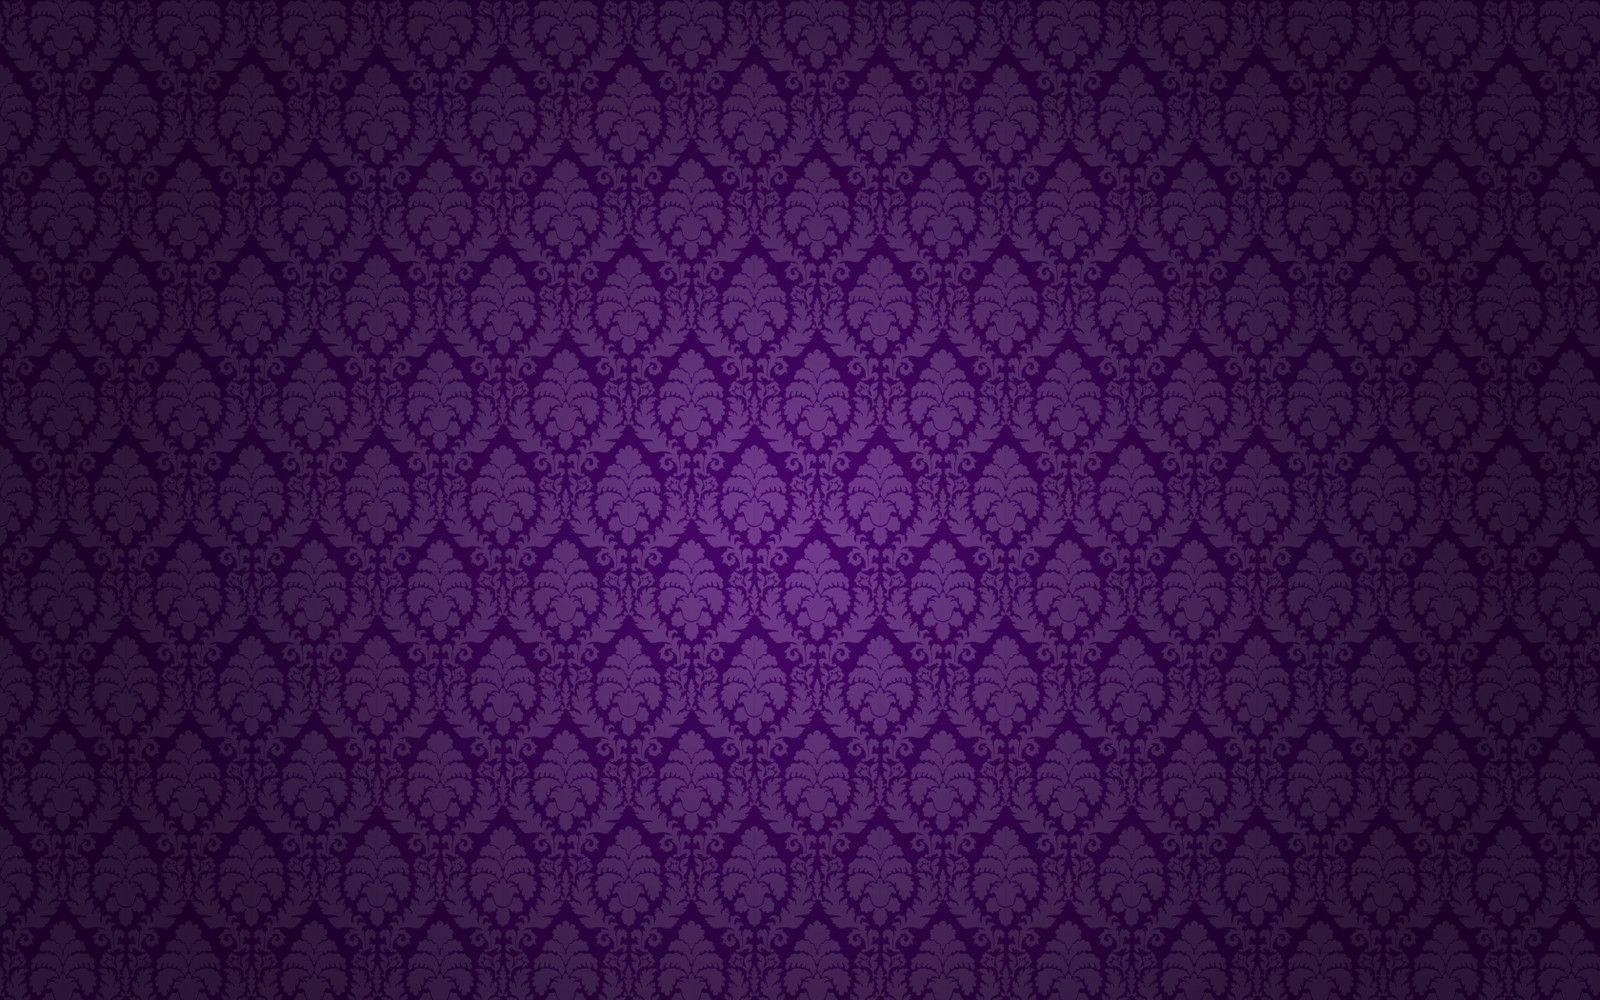 Purple Wallpapers Hd Wallpaper 1920 215 1200 Purple Wallpapers